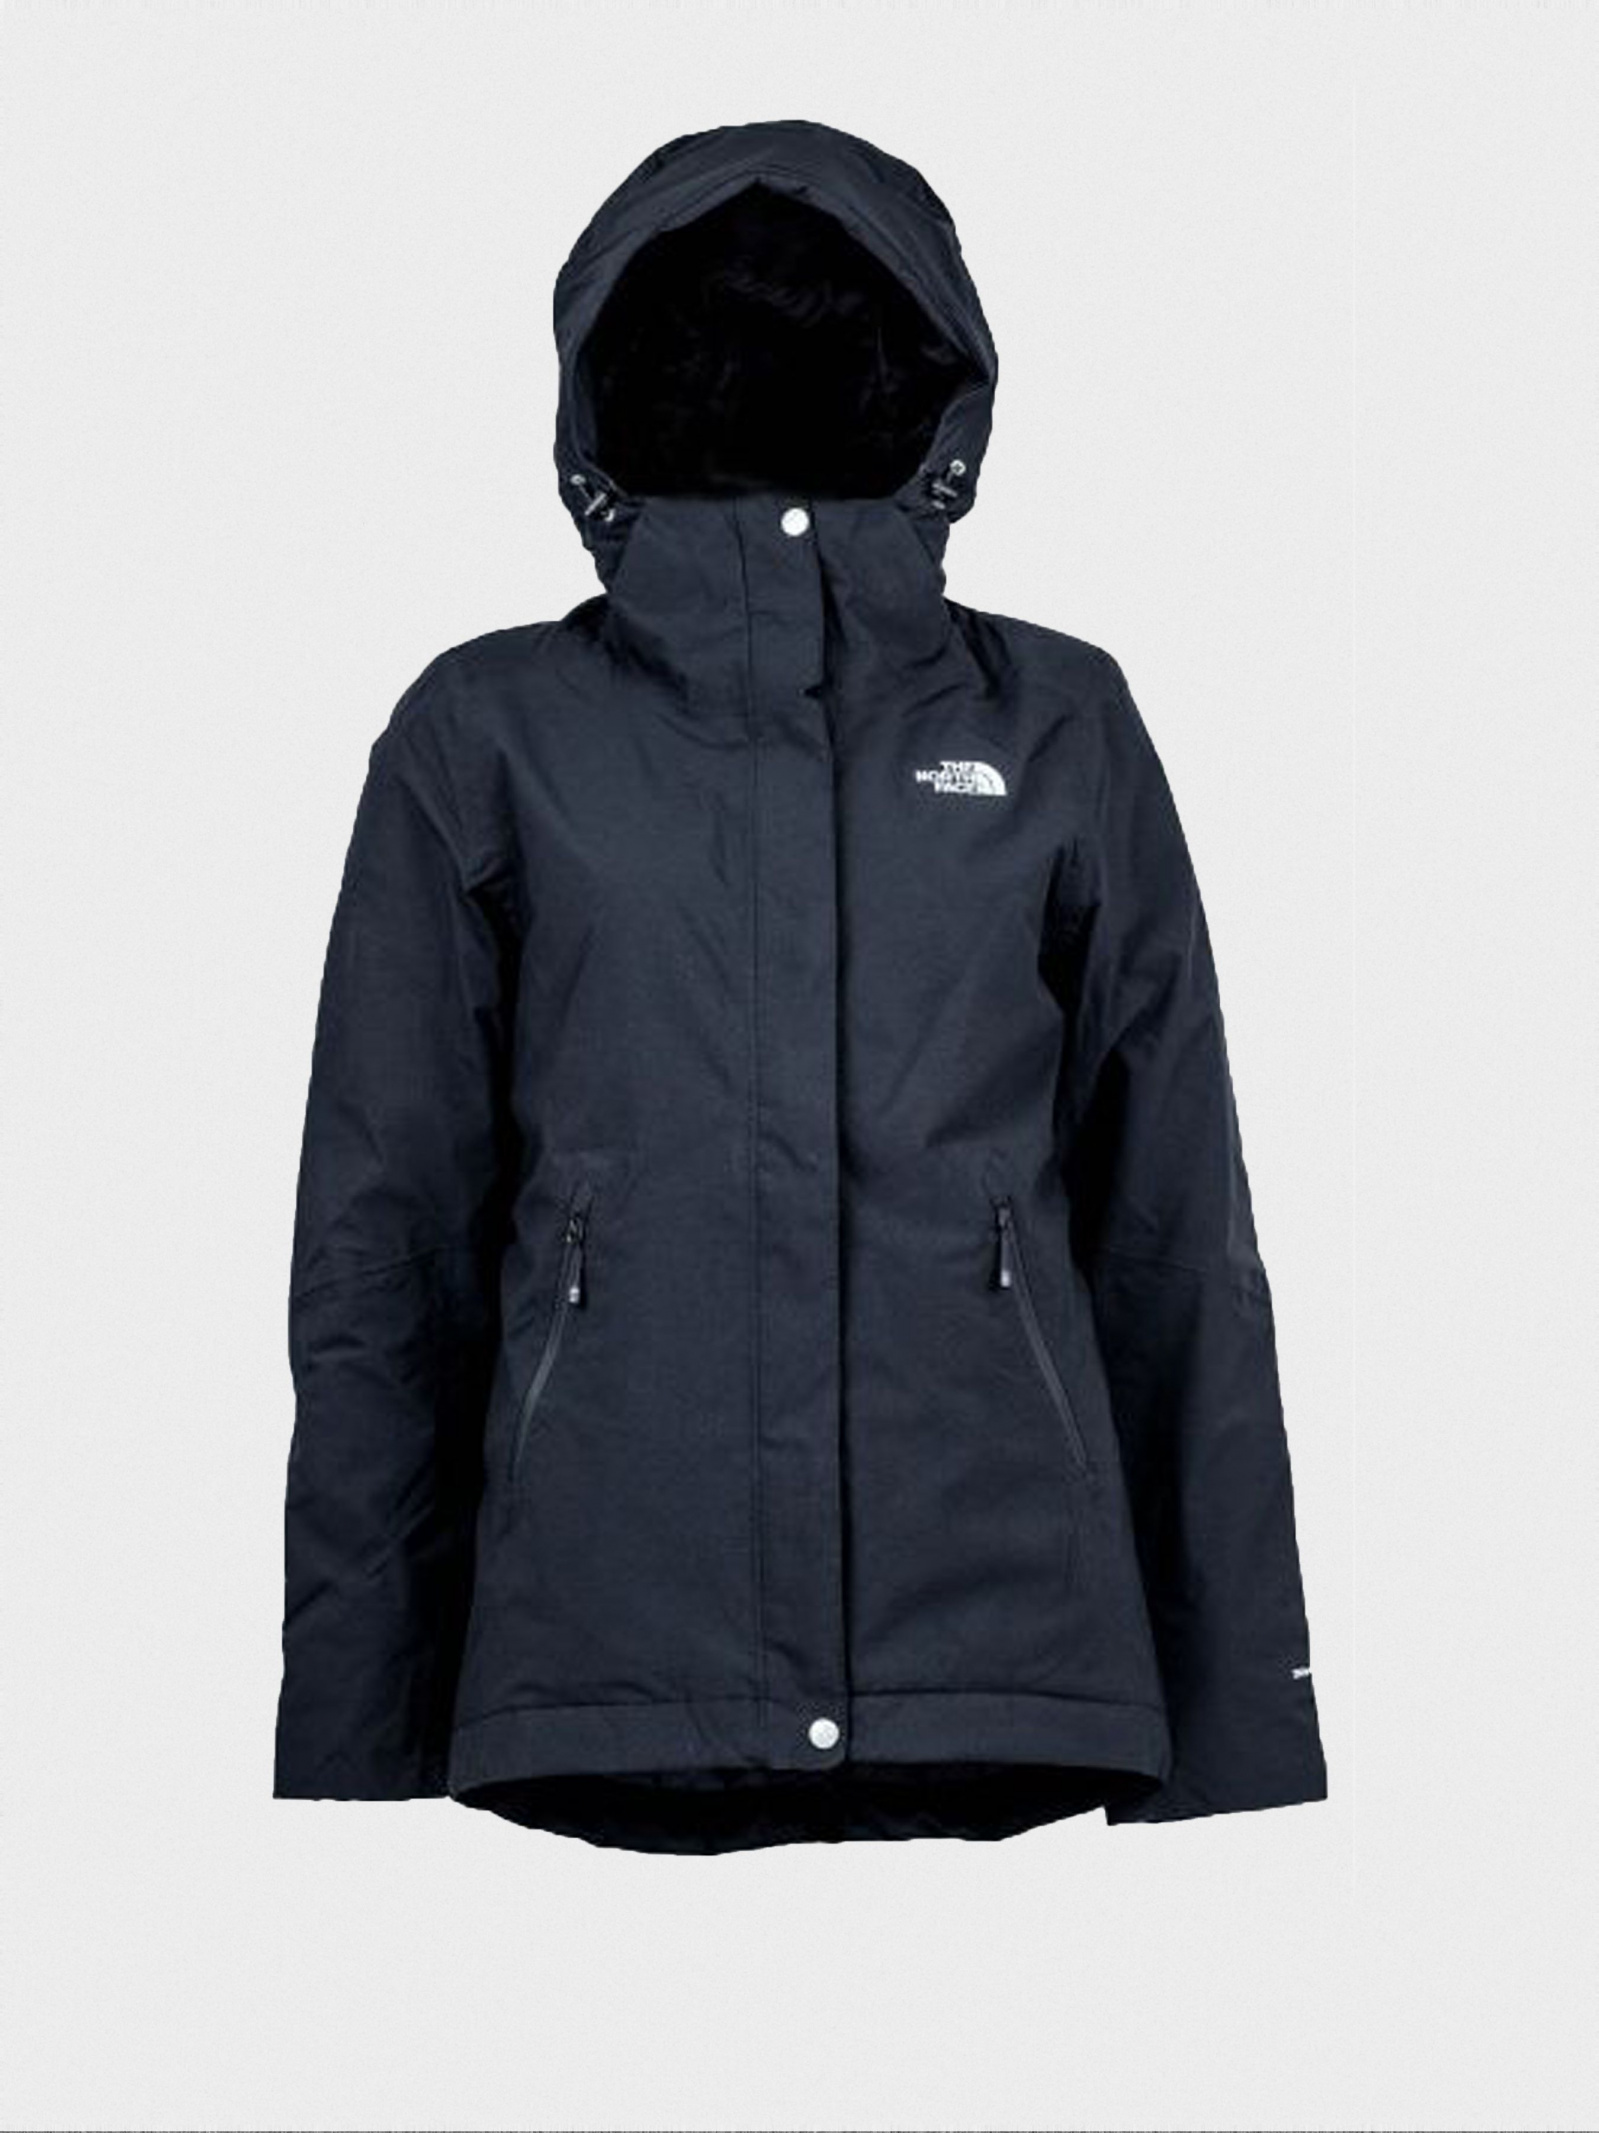 Куртка женские The North Face модель N137 цена, 2017